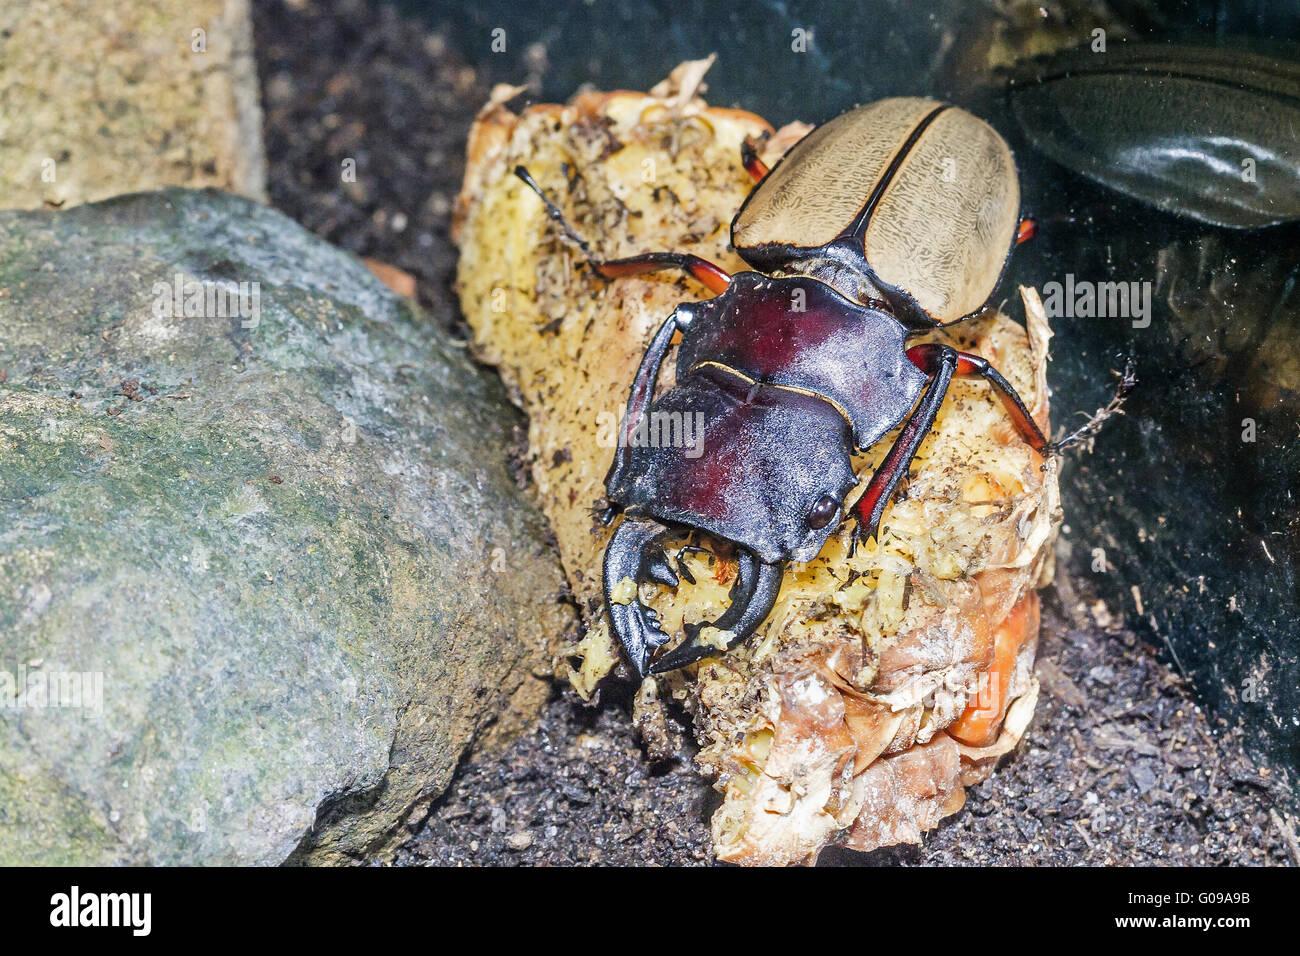 Giant Yellow Stag Beetle (Odontolabis femoralis) T - Stock Image